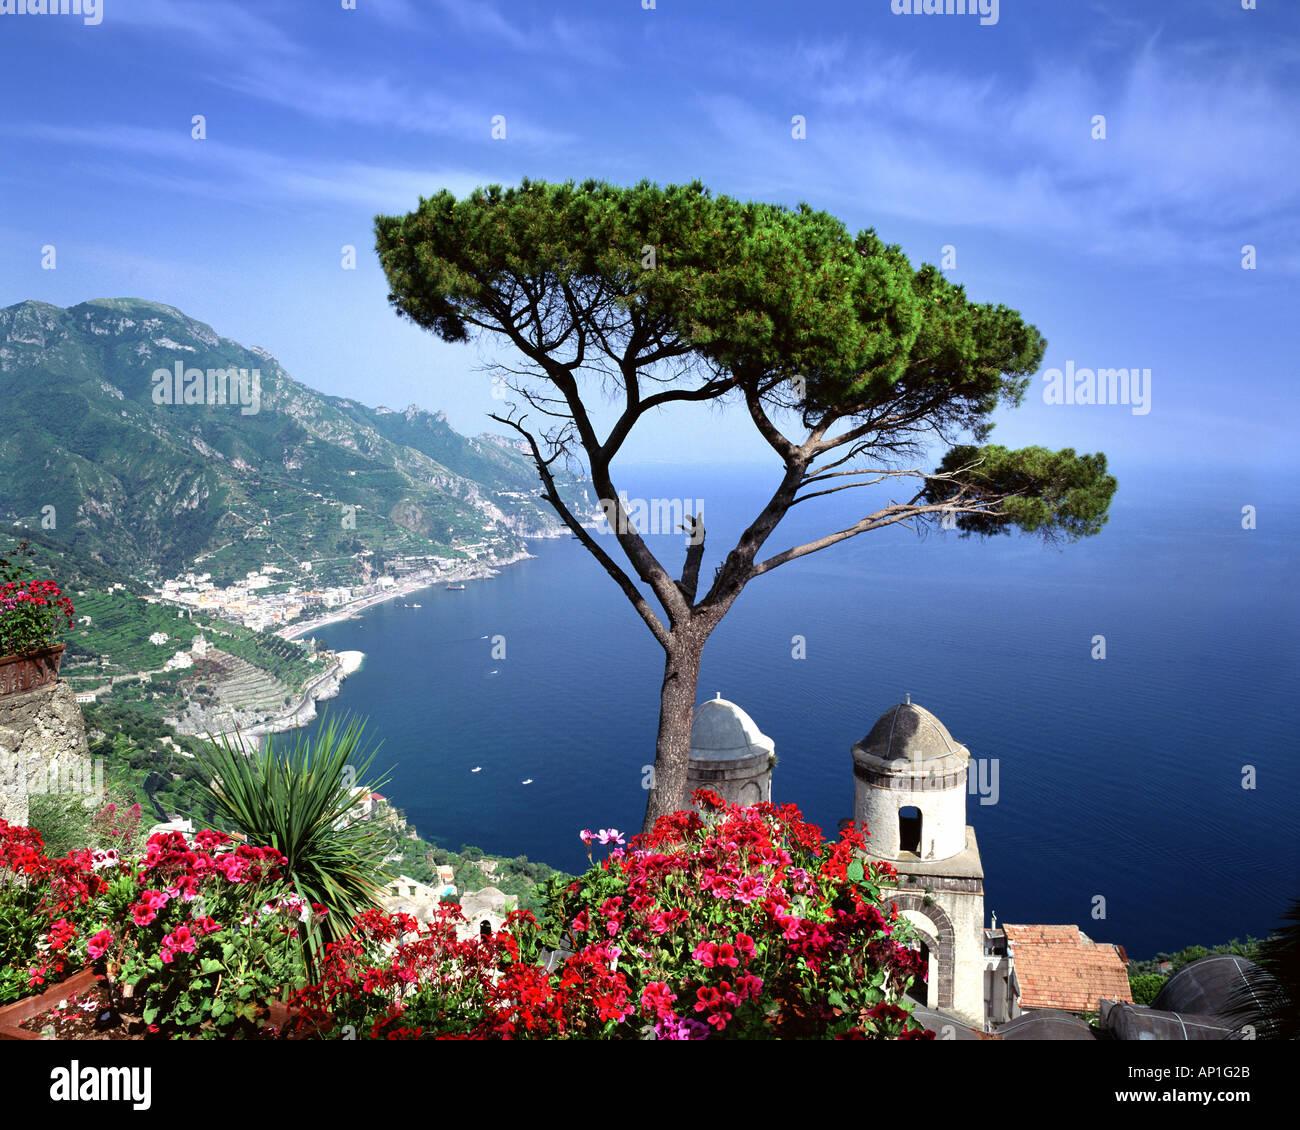 IT - CAMPANIA: Villa Rufolo in Ravello mit Blick auf den Golf von Salerno Stockbild